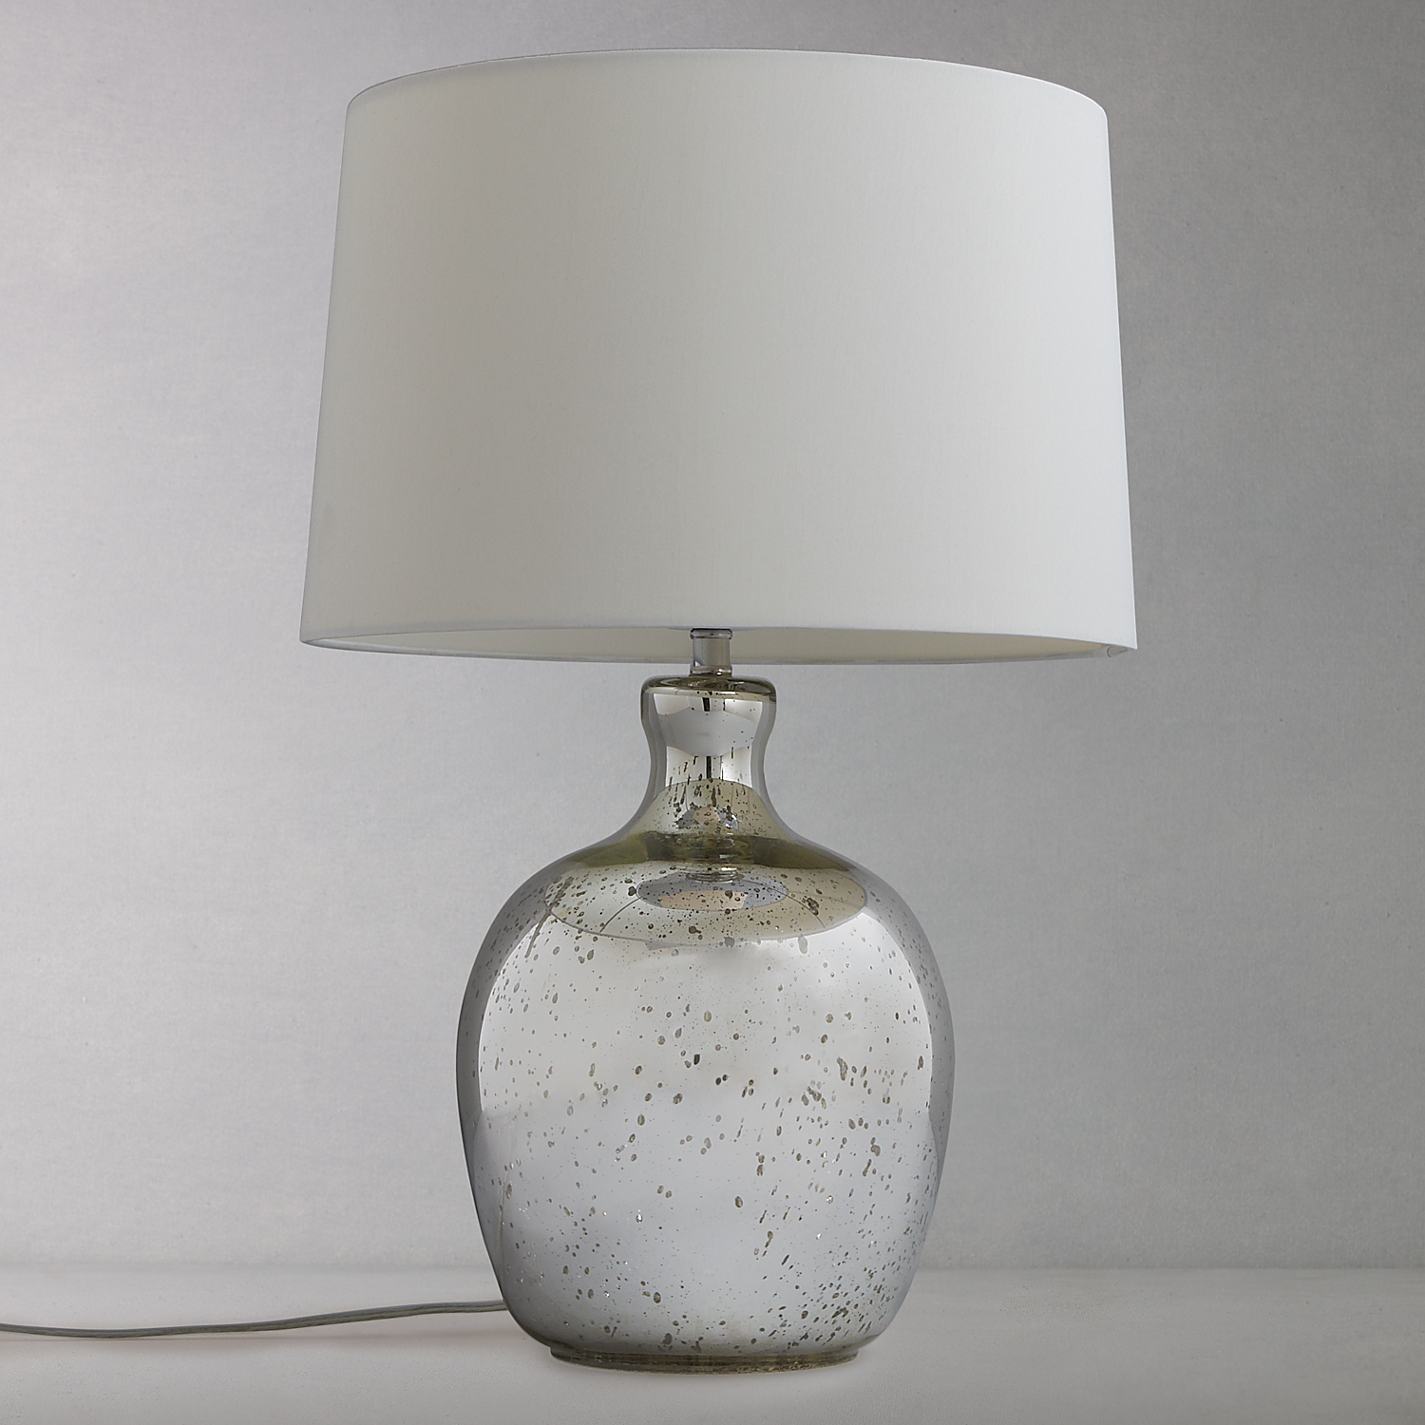 mirror-table-lamp-photo-13